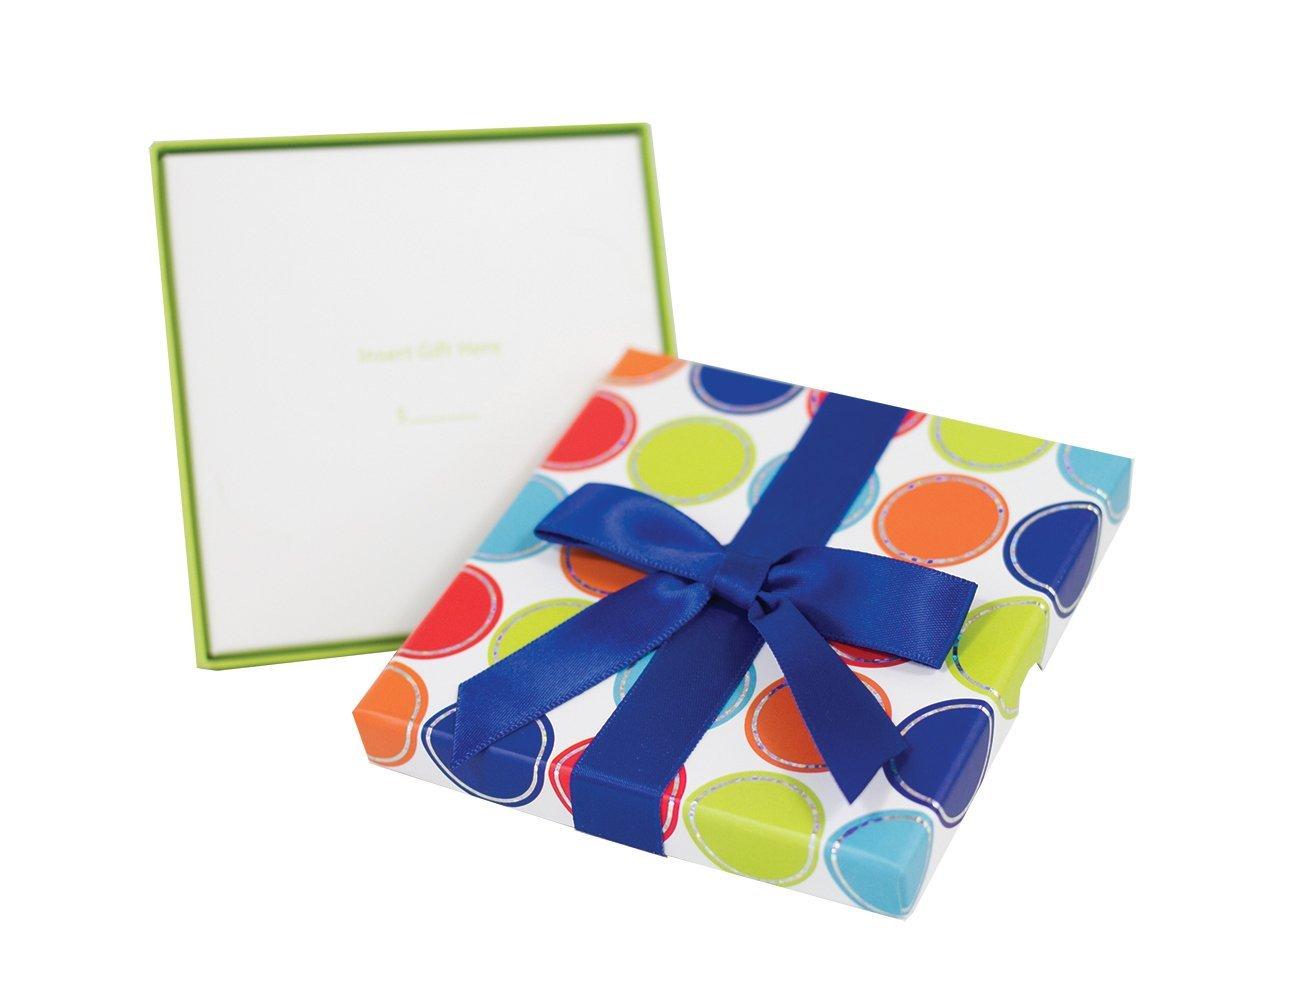 Small Thin Lidded Box Multicircles Gift Card Impressions LLC